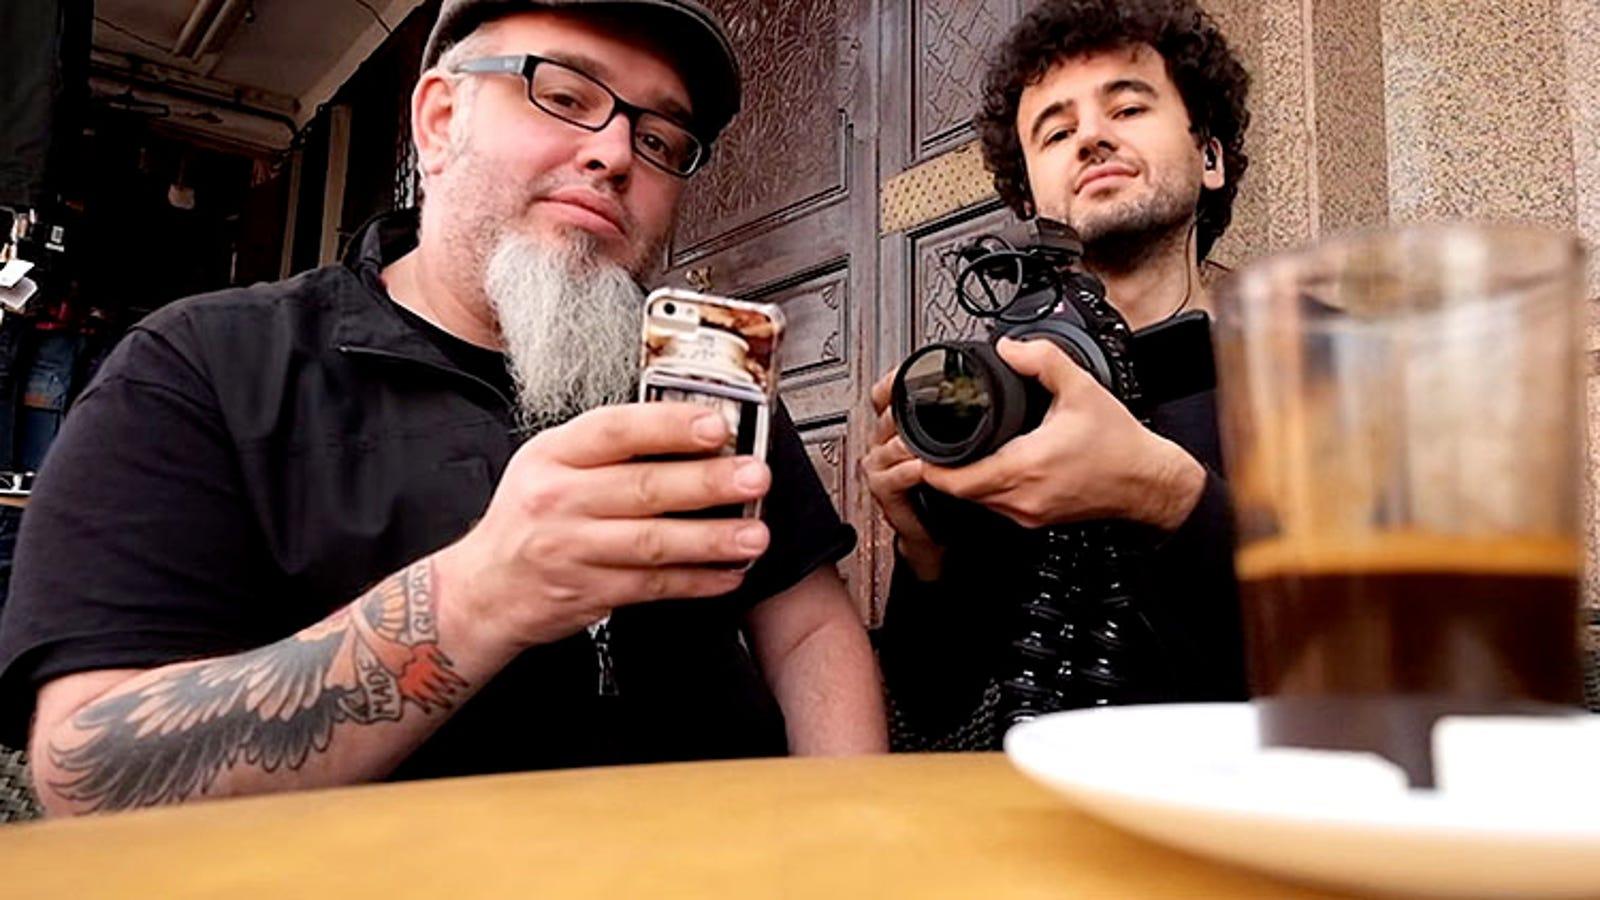 Cinco consejos muy prácticos para fotografiar a desconocidos